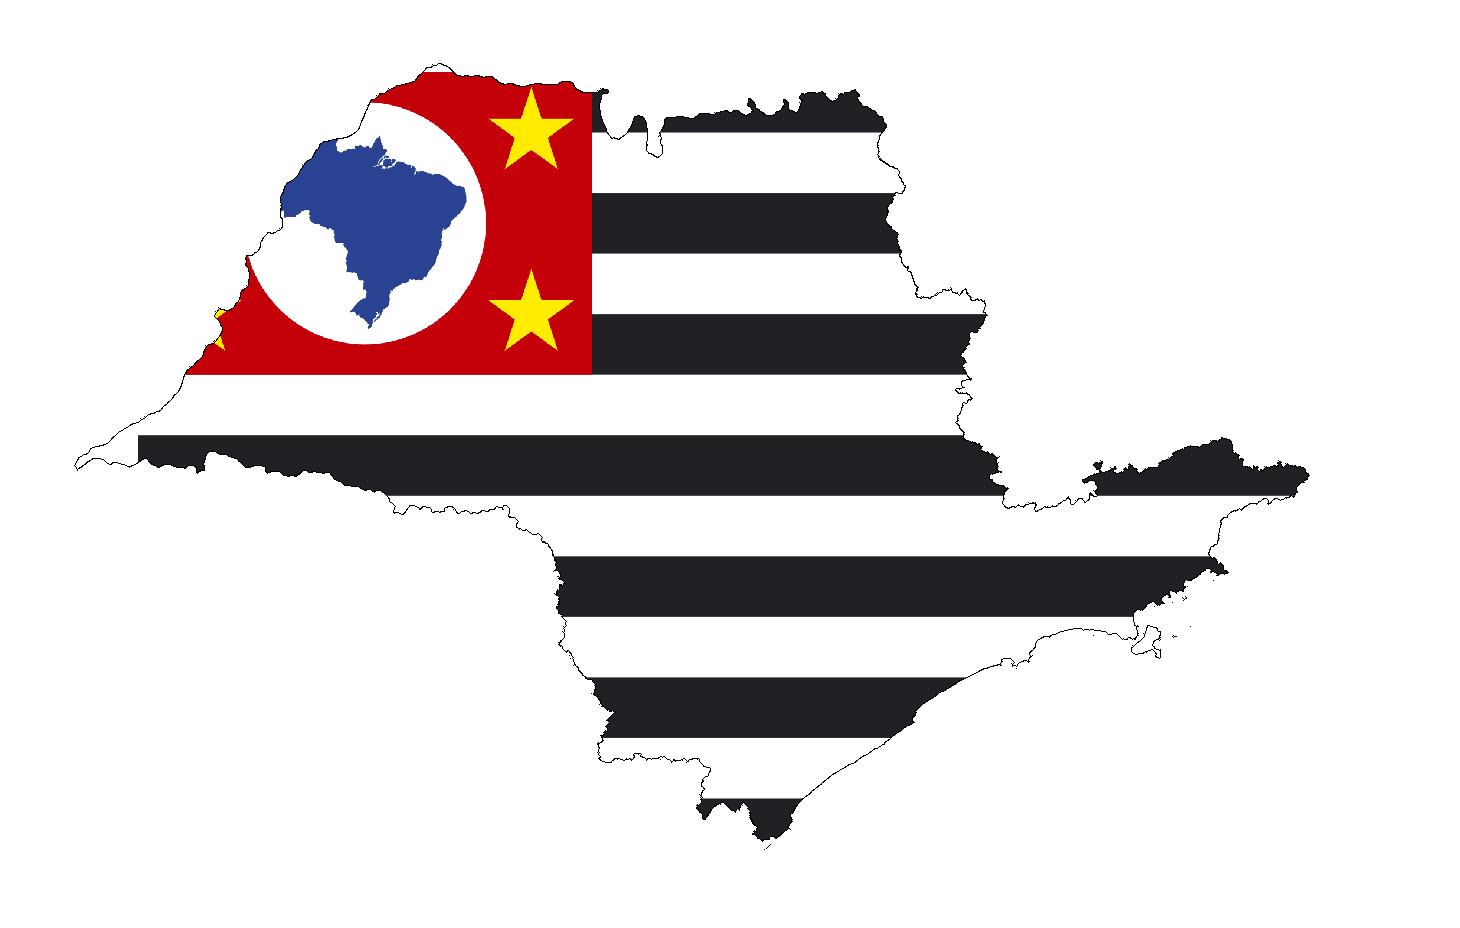 Sao Paulo State Map.File Sao Paulo State Flag Map Png Wikimedia Commons